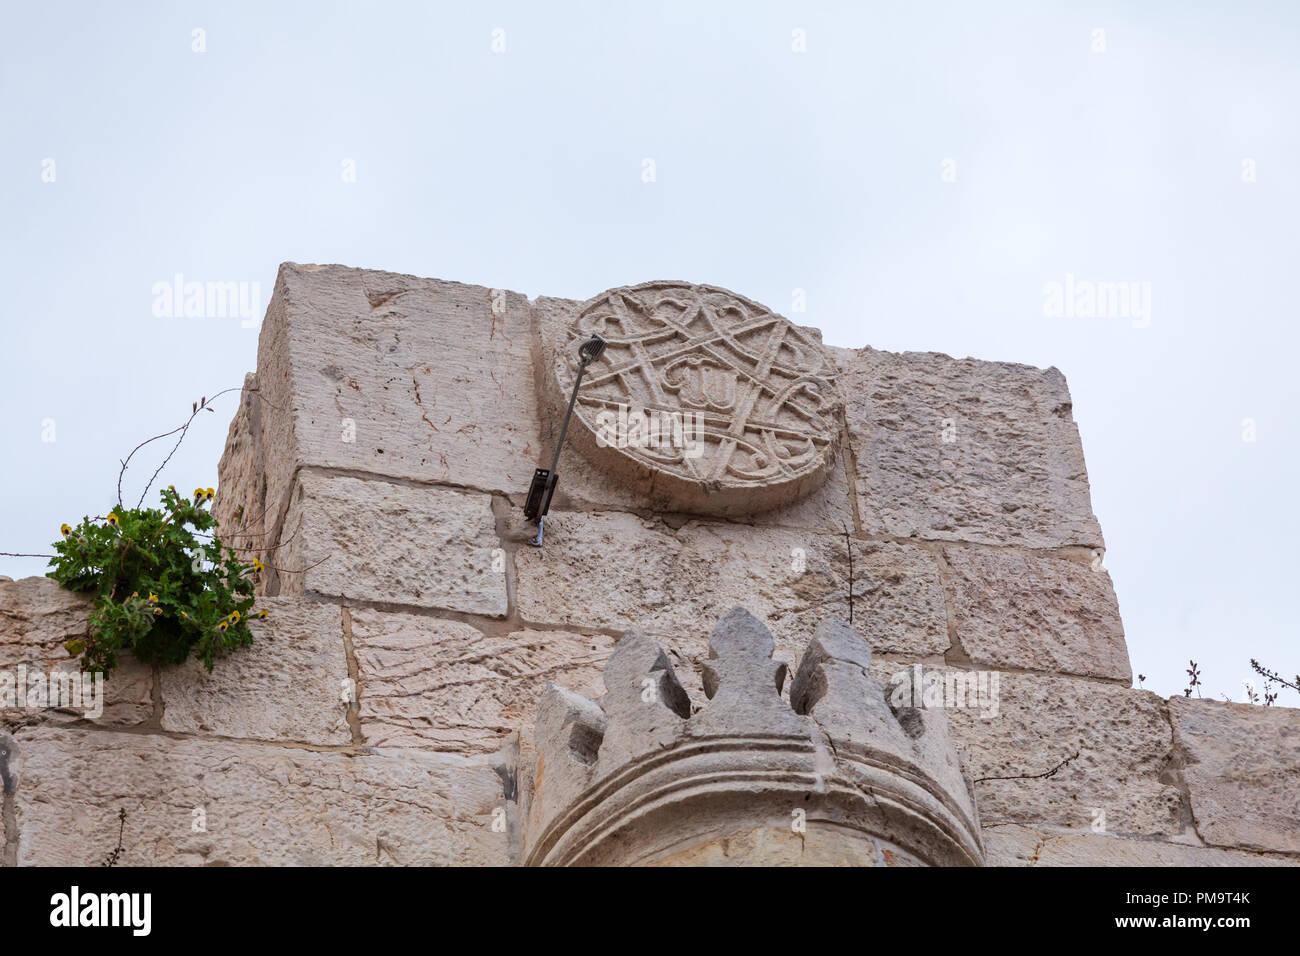 Street Sign Jaffa Gate in Old City, Jerusalem, Israel Stock Photo